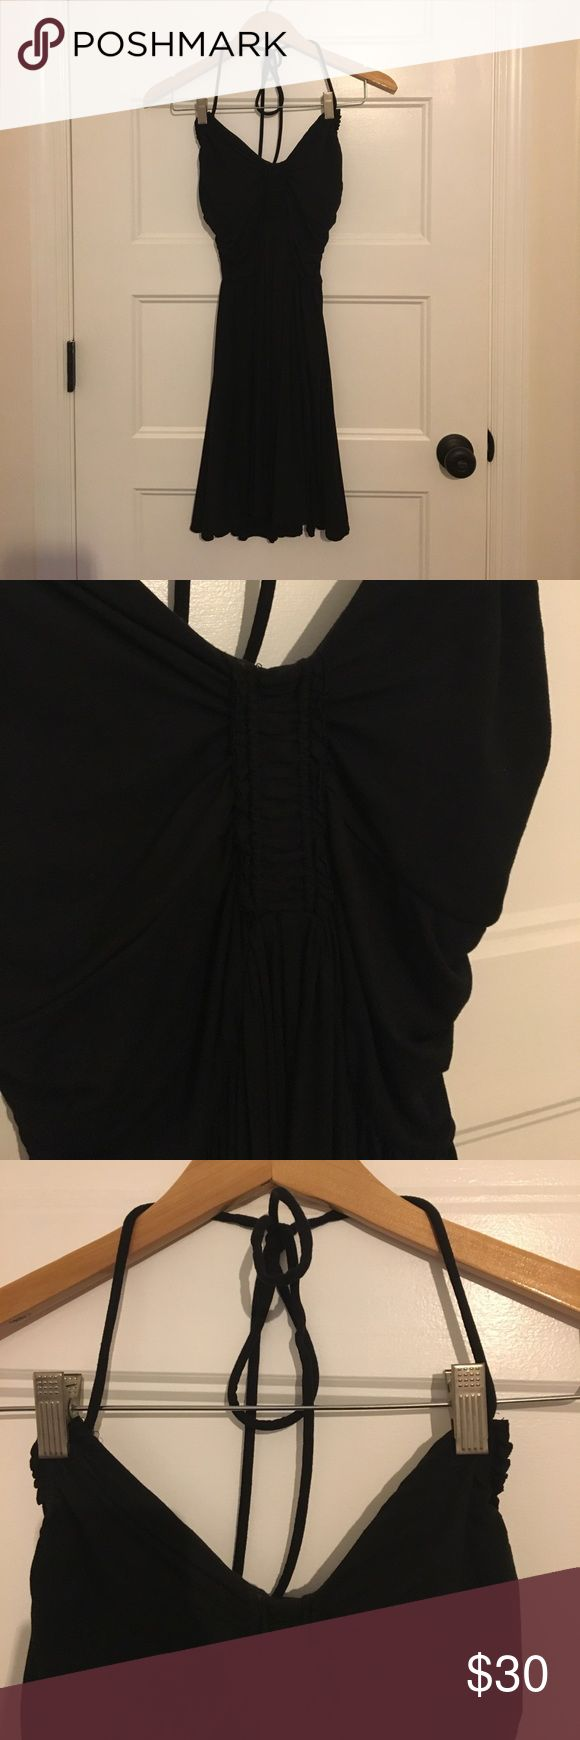 VICTORIAS SECRET Little Black Dress NEVER WORN - LBD w/ built in strapless bra - form fitting and flattering - adjustable neck tie Victoria's Secret Dresses Strapless